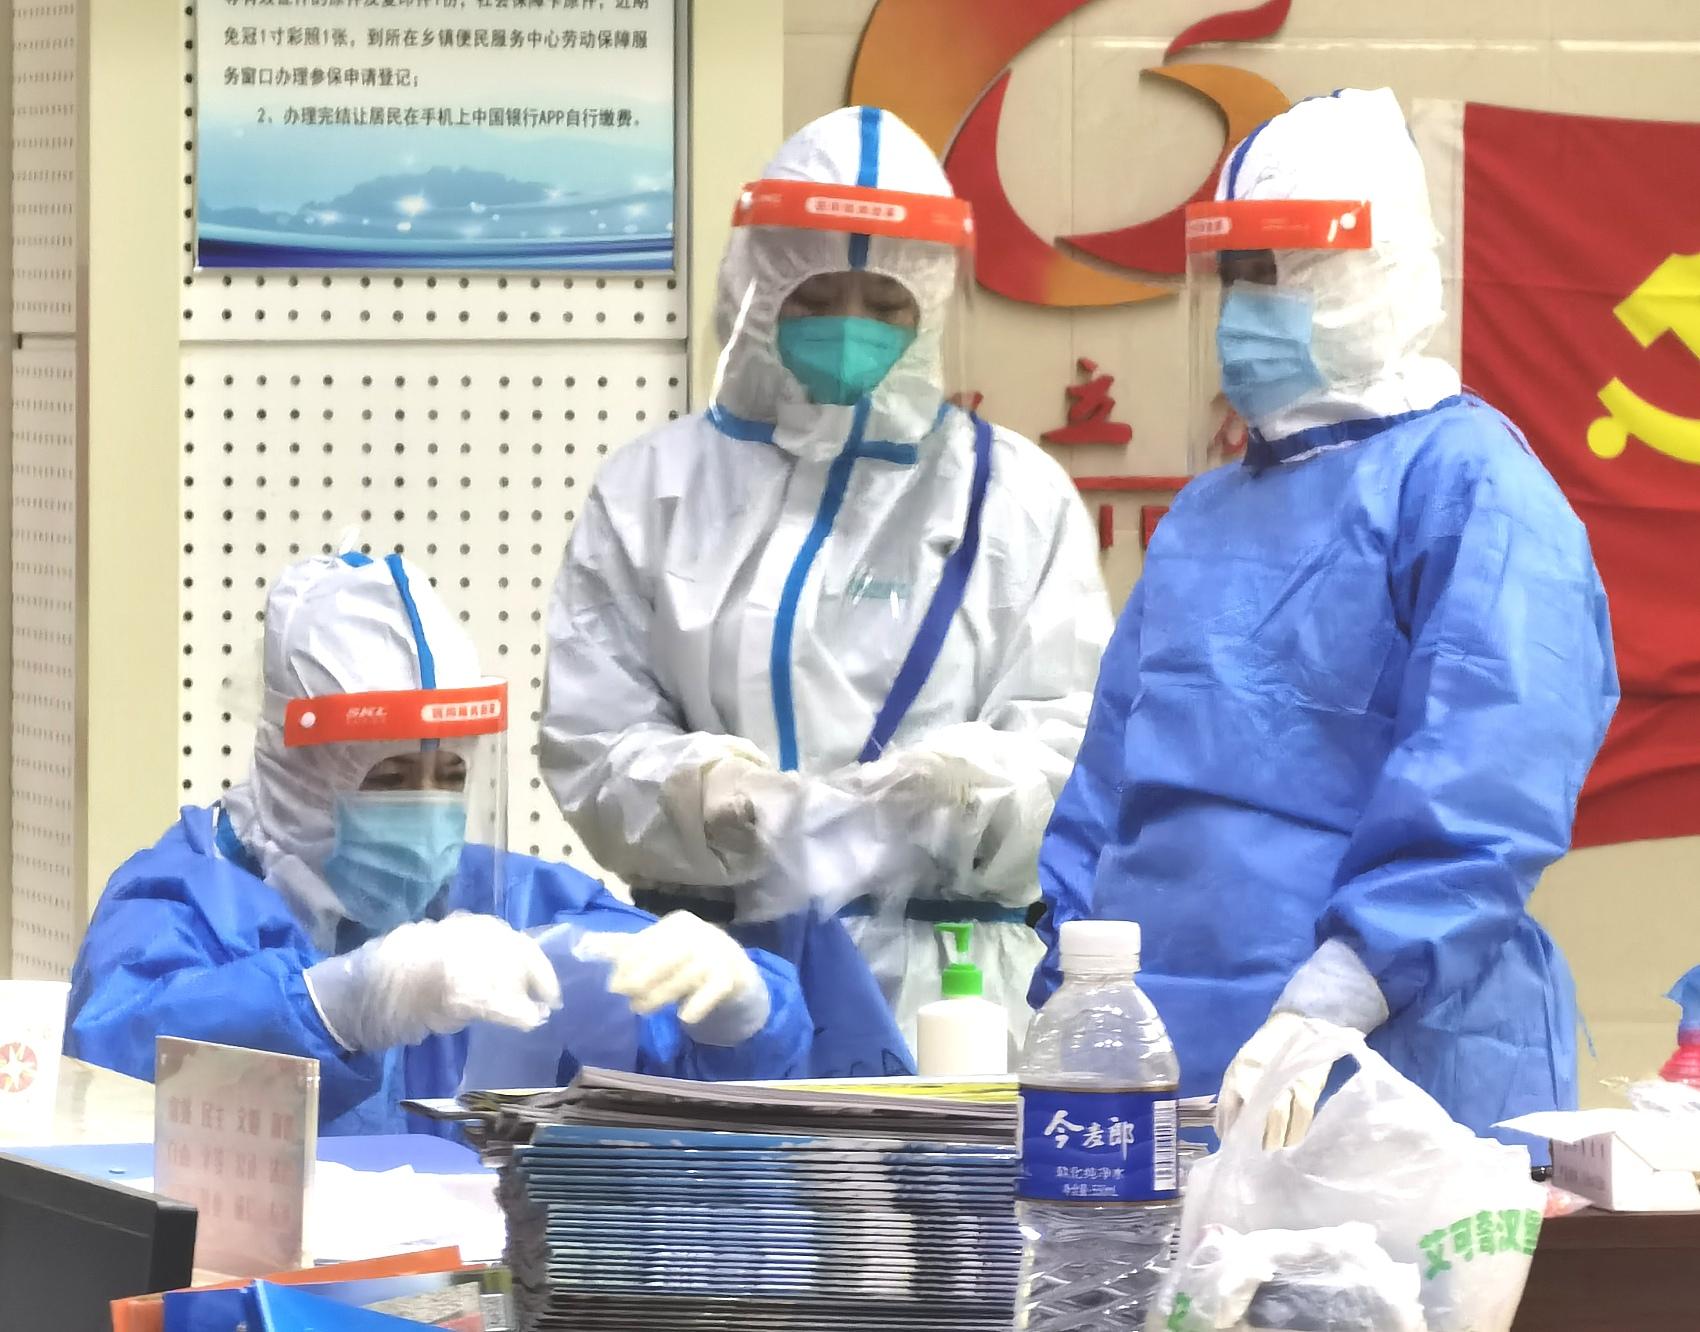 China's Heilongjiang reports 1 new asymptomatic COVID-19 case